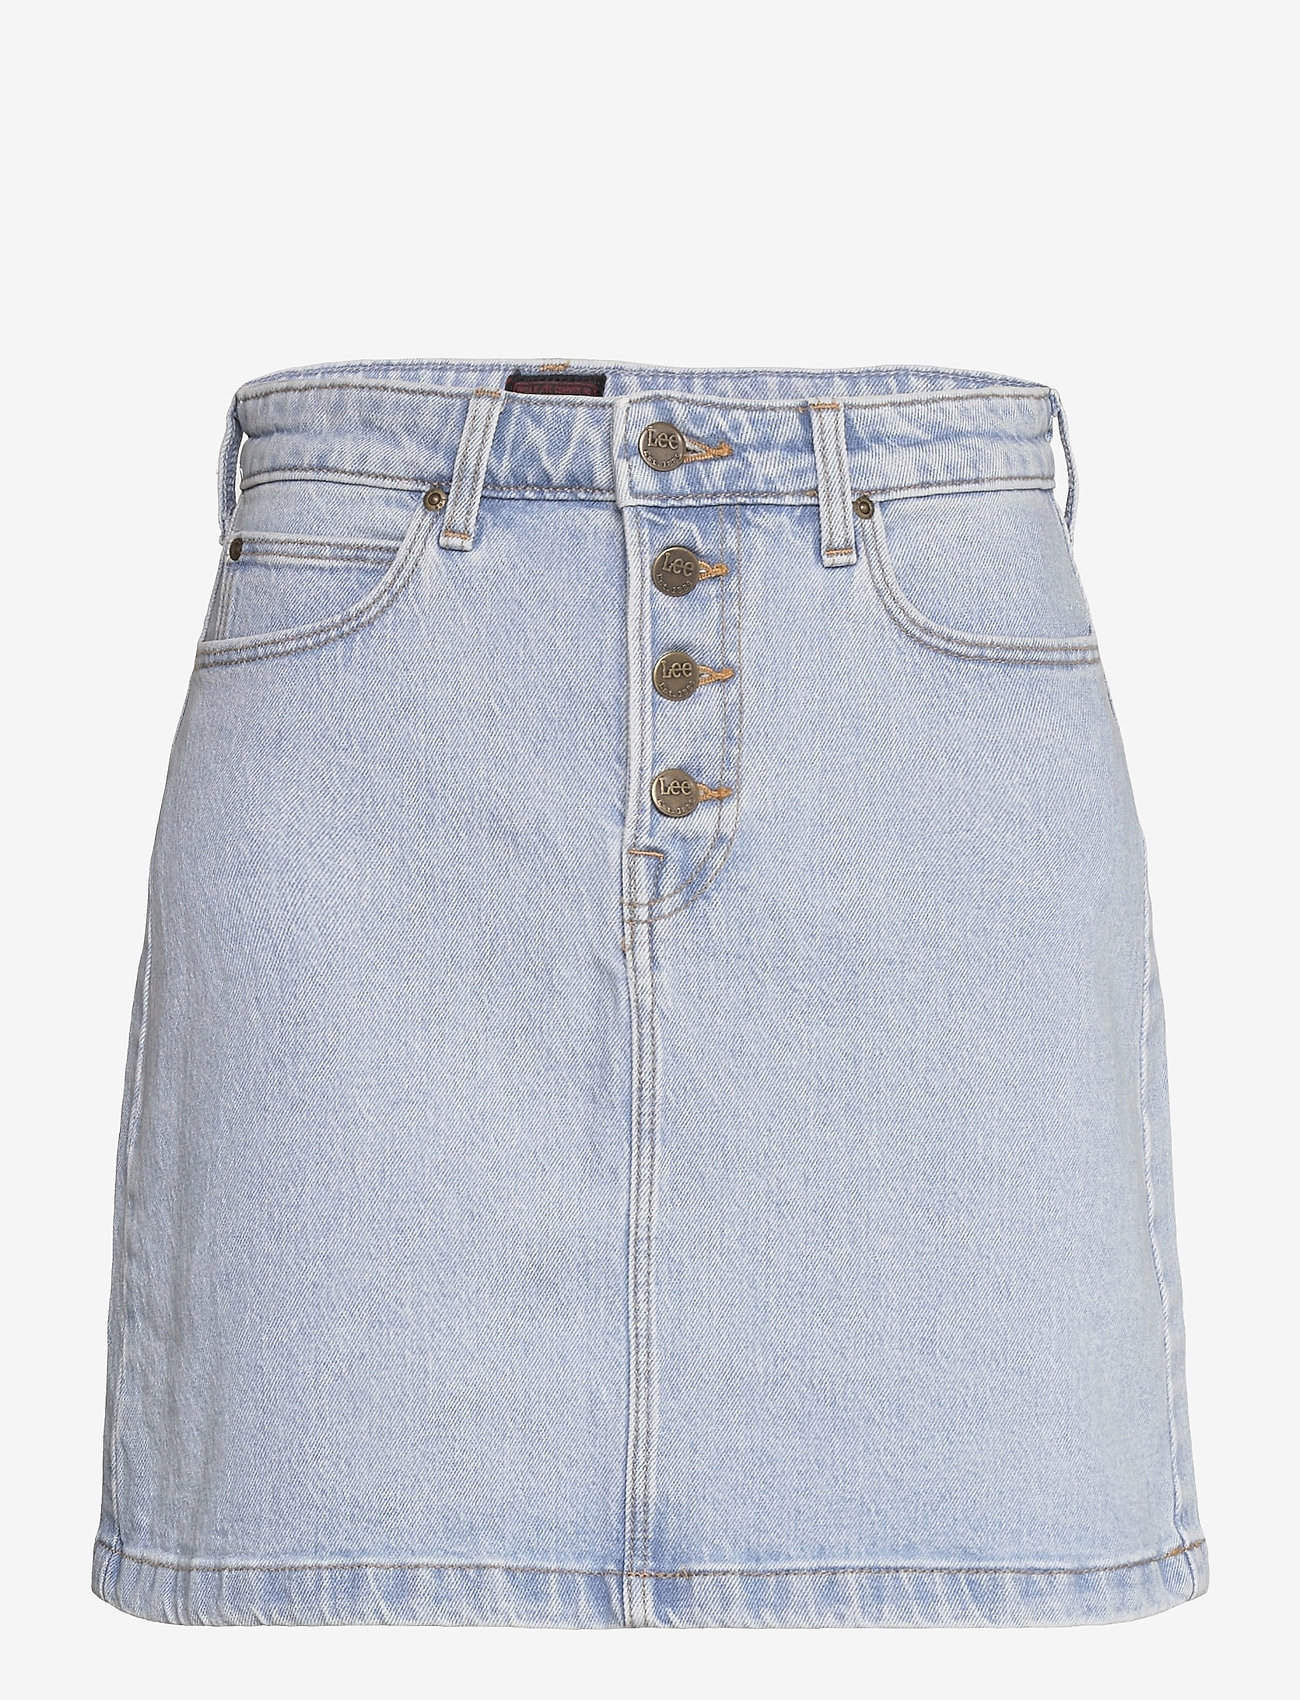 Lee Jeans - BUTTON FLY A LINE SK - jeanskjolar - light alton - 0